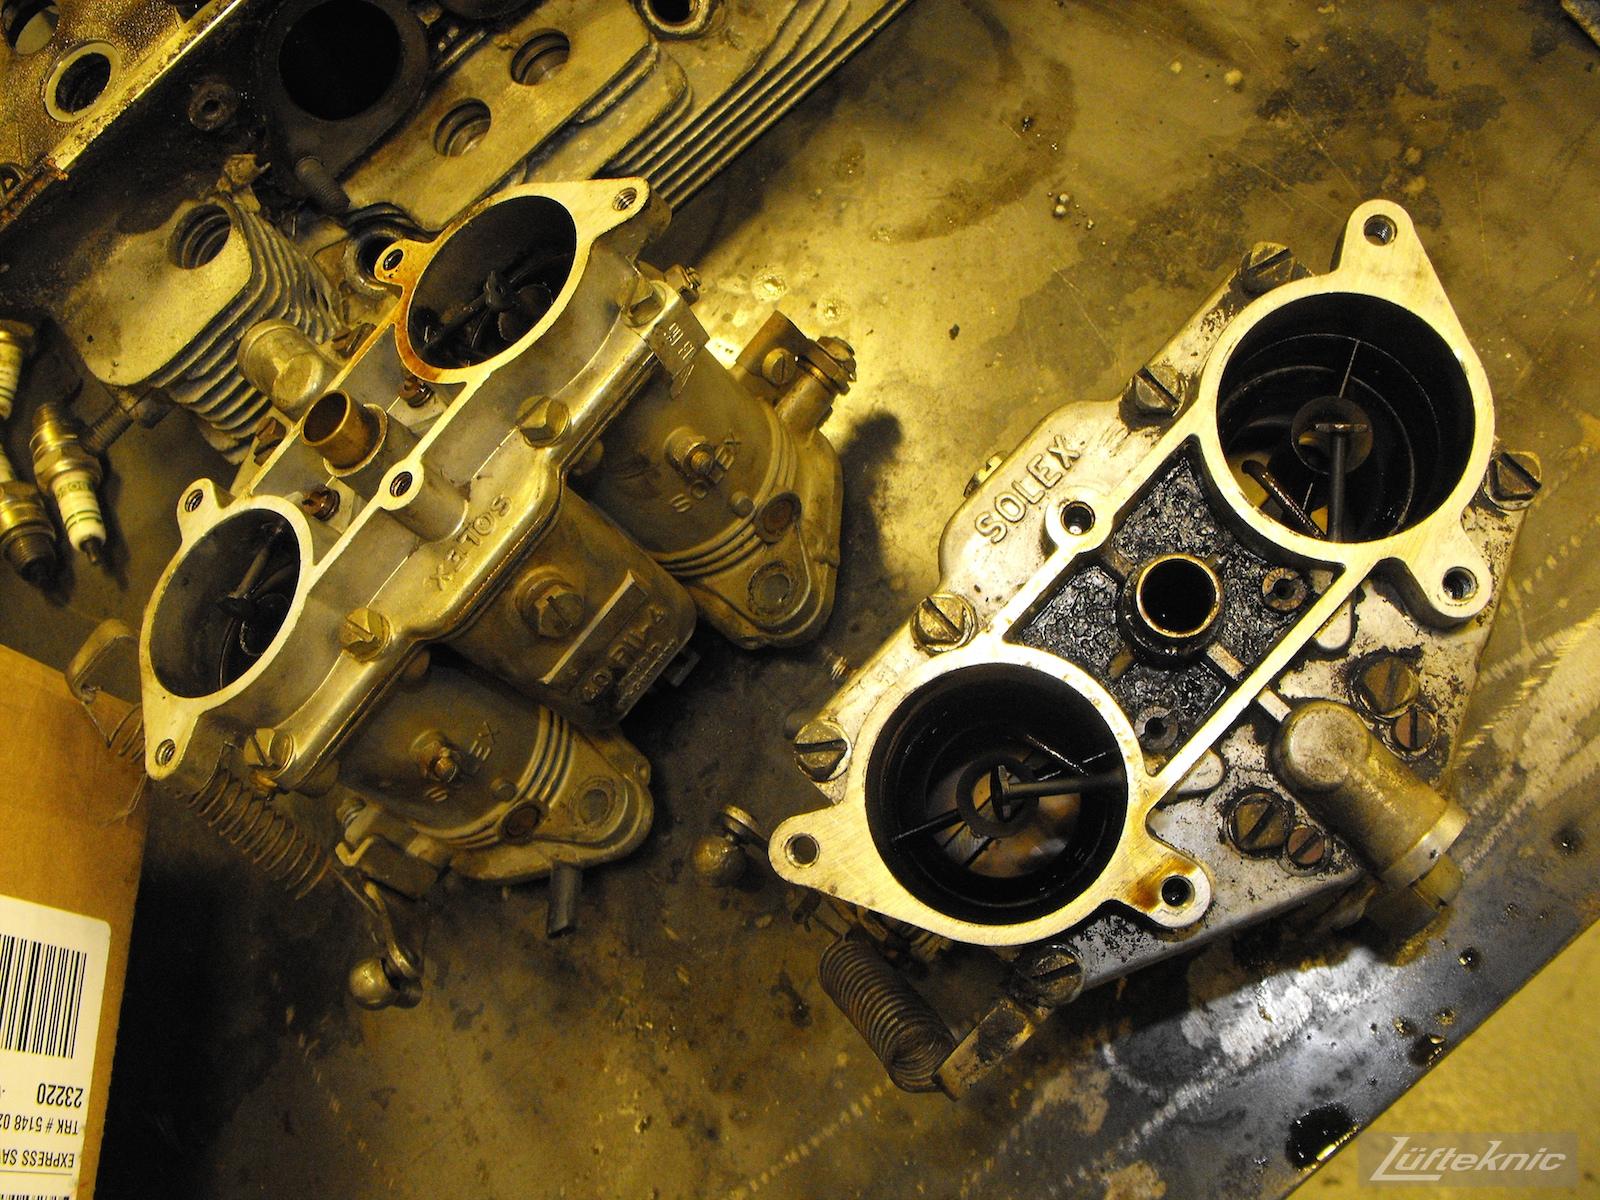 Dirty carburetors from an Irish Green Porsche 912 undergoing restoration at Lufteknic.